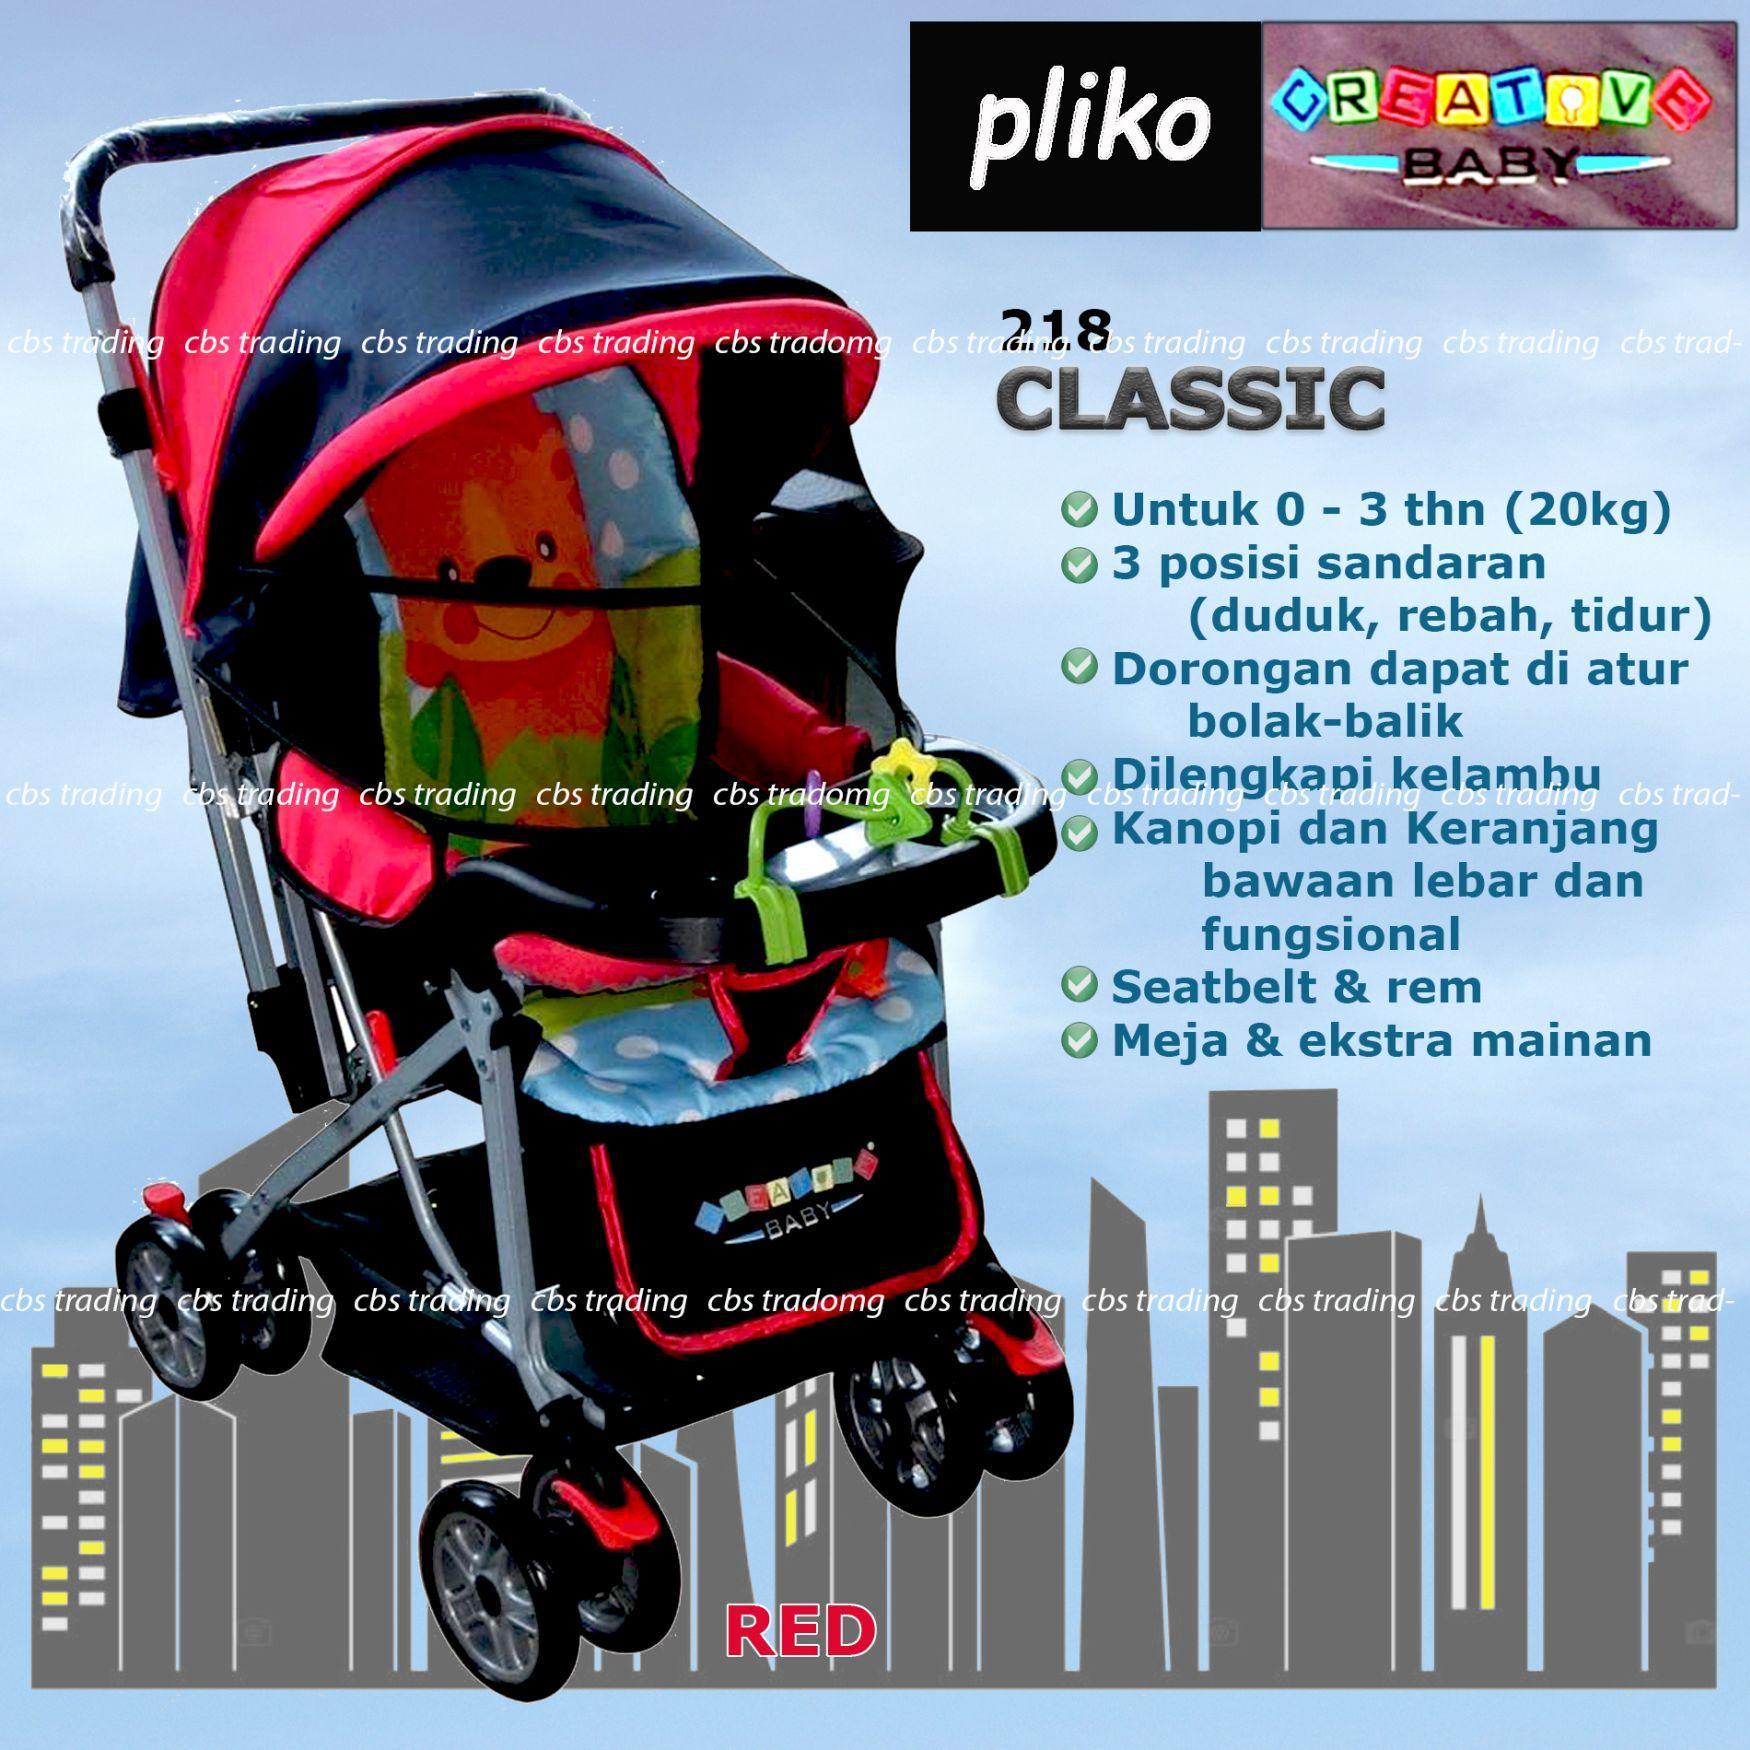 Pliko Creative Classic Baby Stroller BS-218 Lightweight - Kereta Dorong Bayi - Red